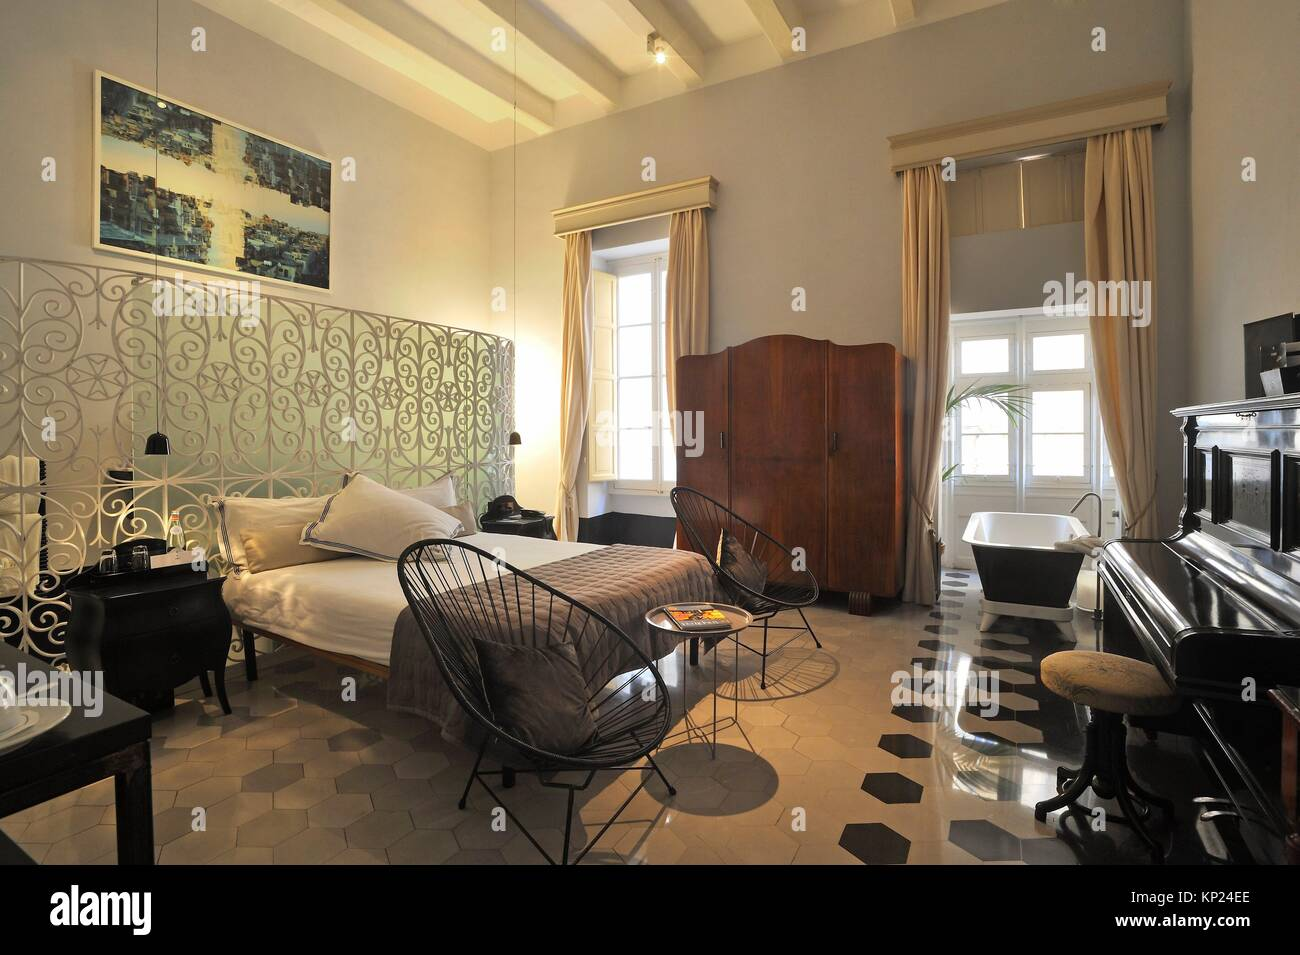 suite of Casa Ellul Hotel, Old Theatre Street, Valletta, Malta, Southern Europe. - Stock Image